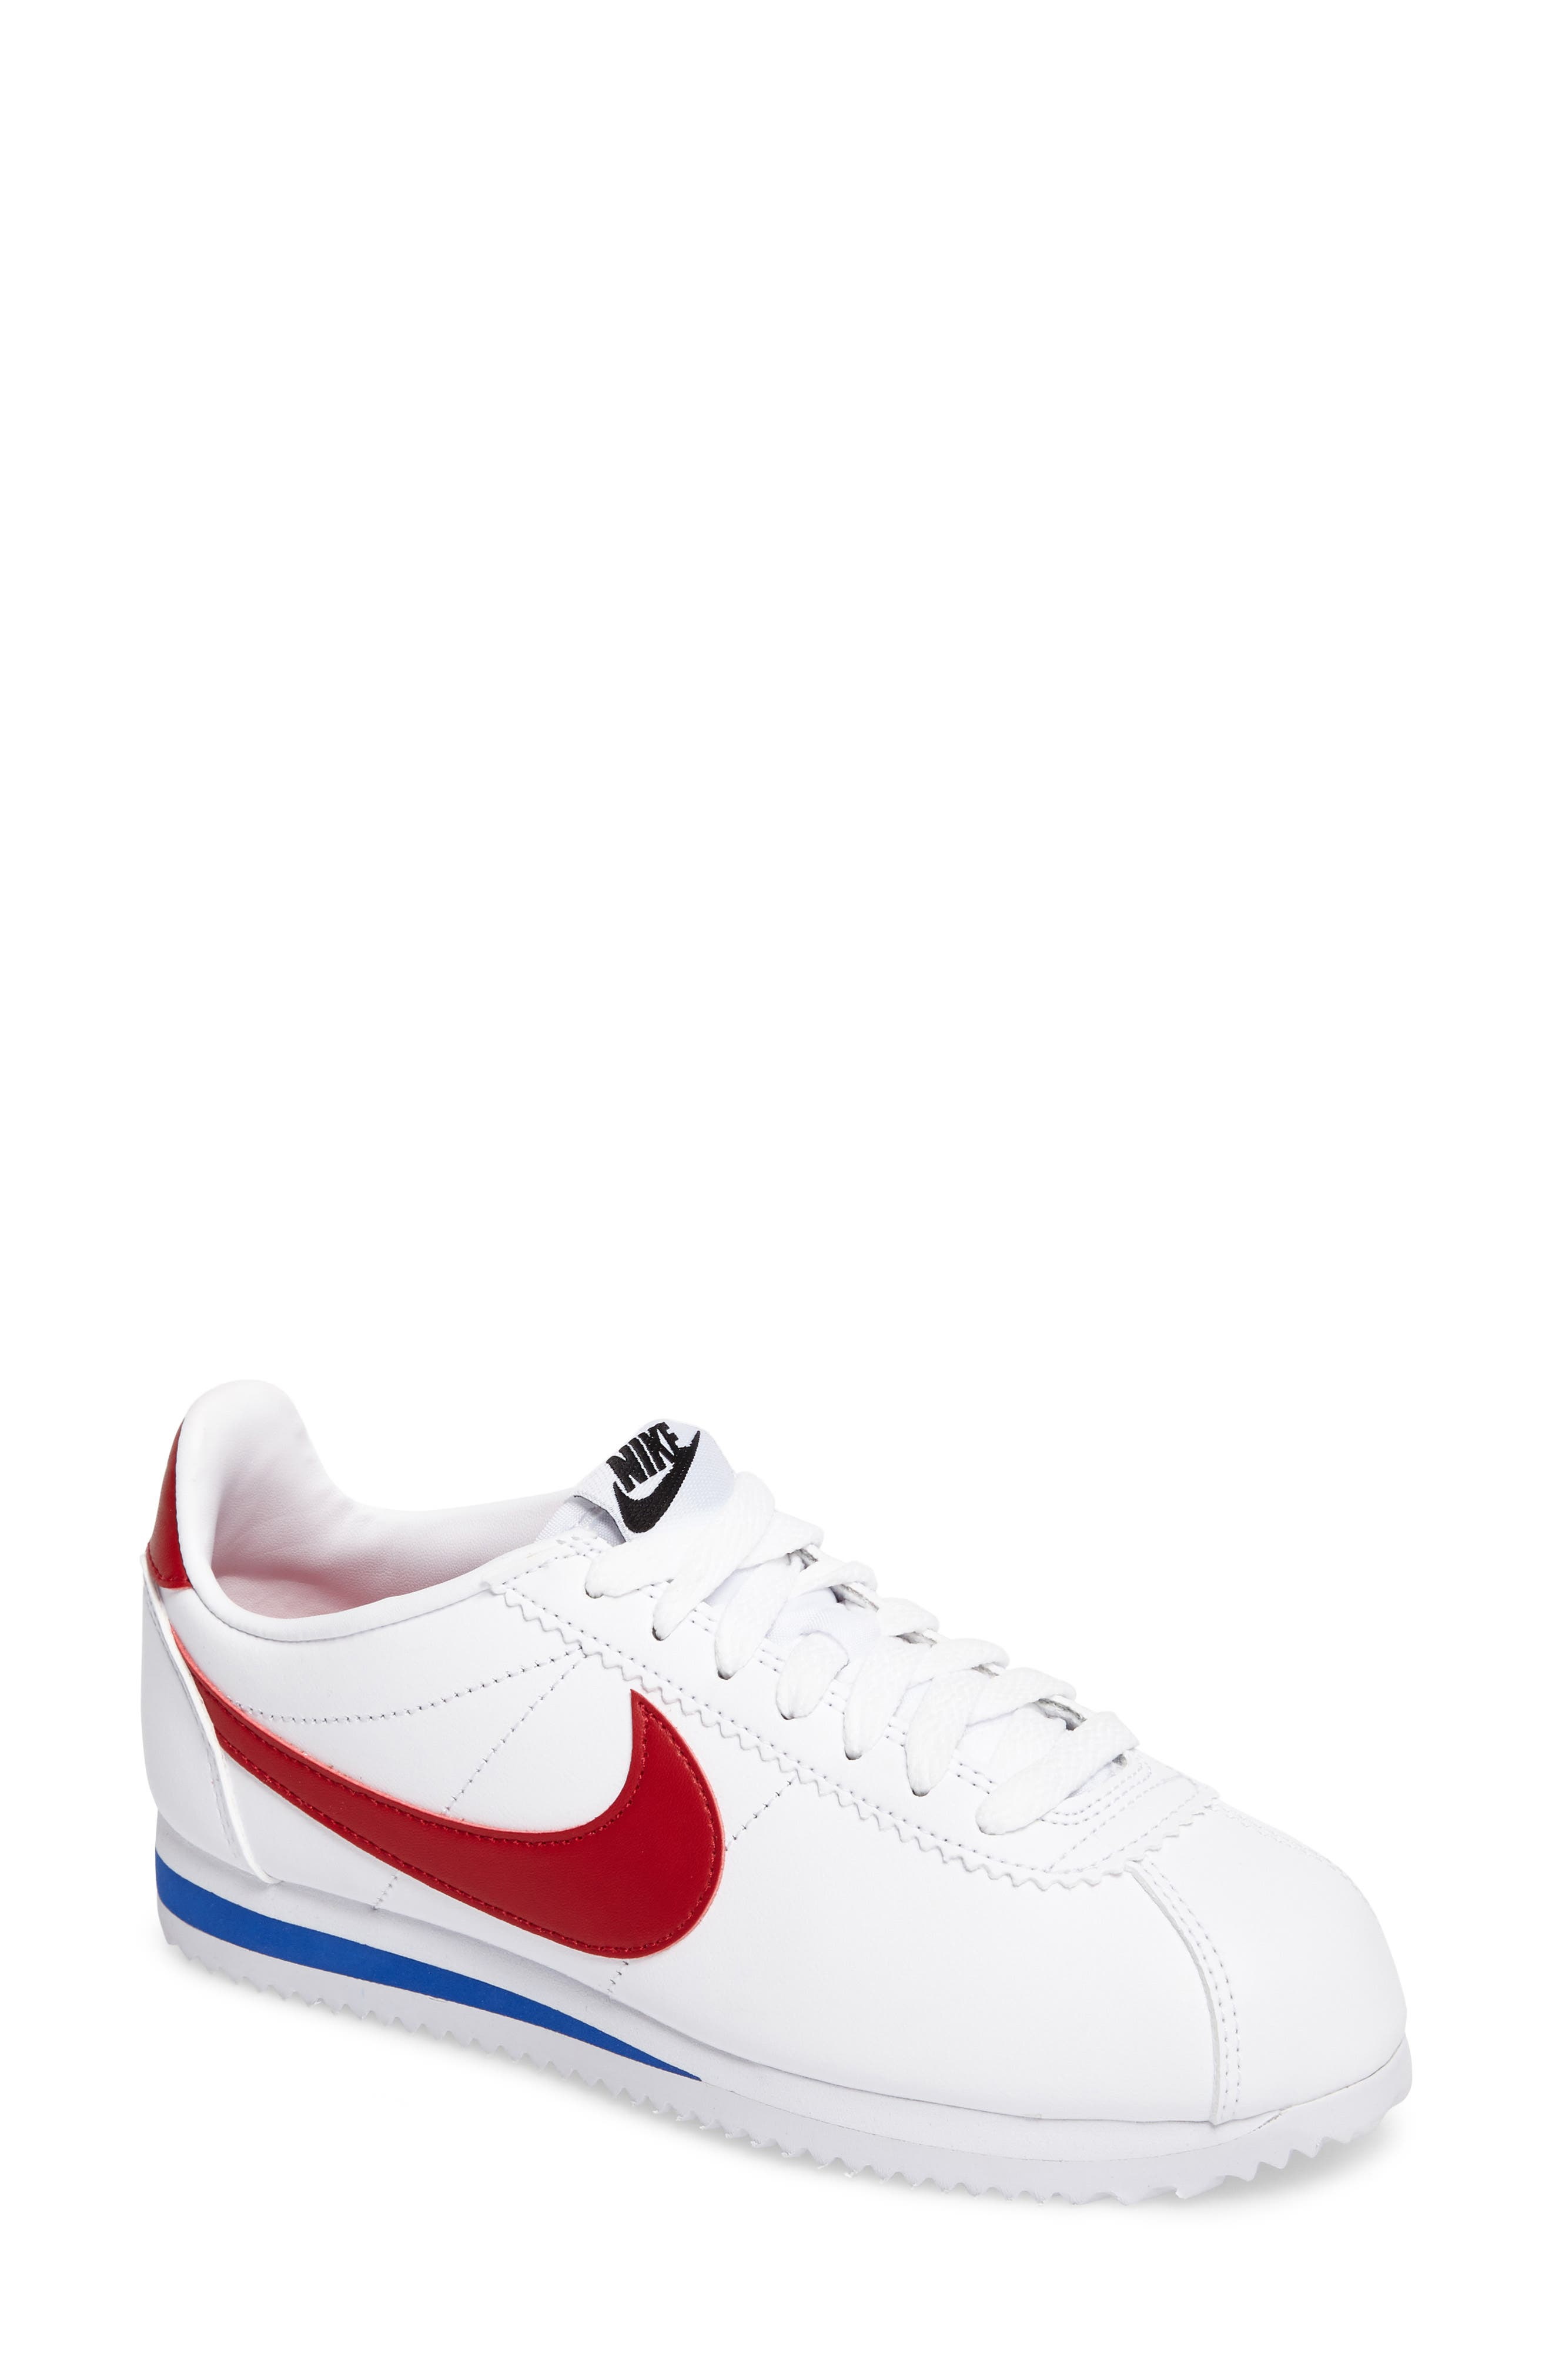 NIKE, Classic Cortez Sneaker, Main thumbnail 1, color, WHITE/ VARSITY RED